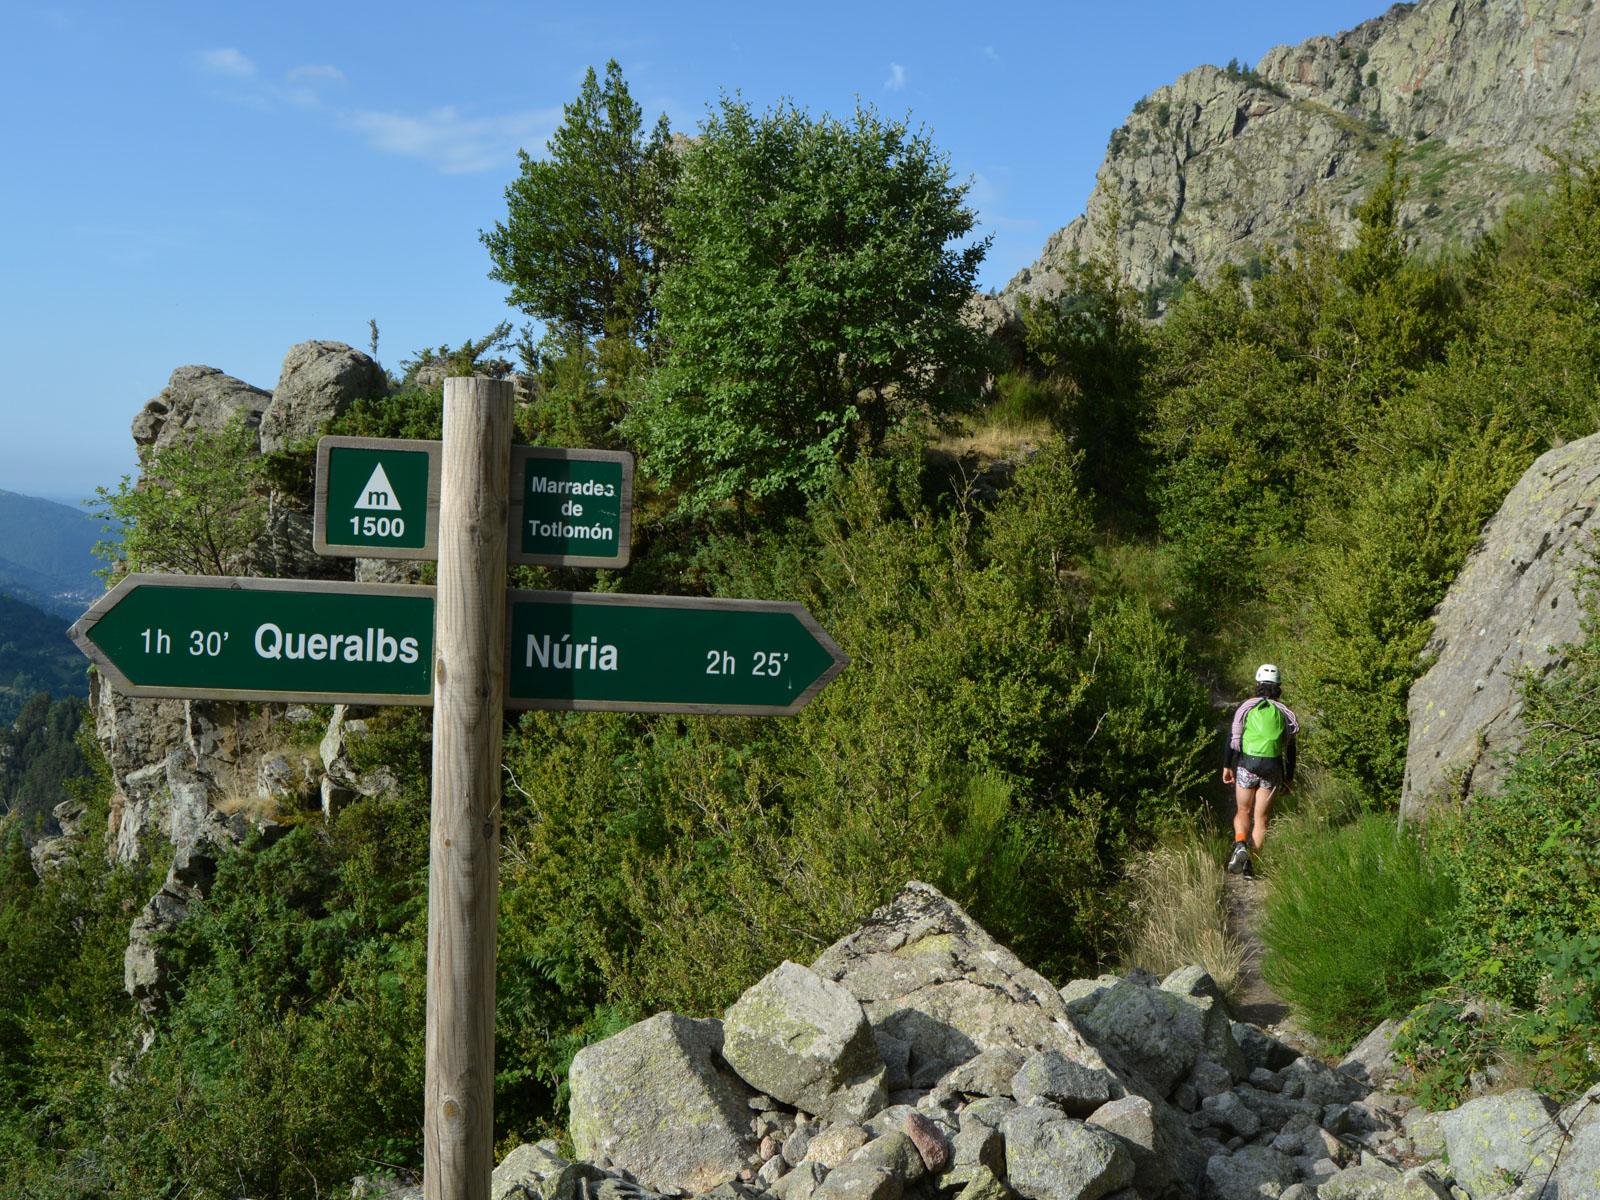 Gorges de Nuria, Catalunya 4